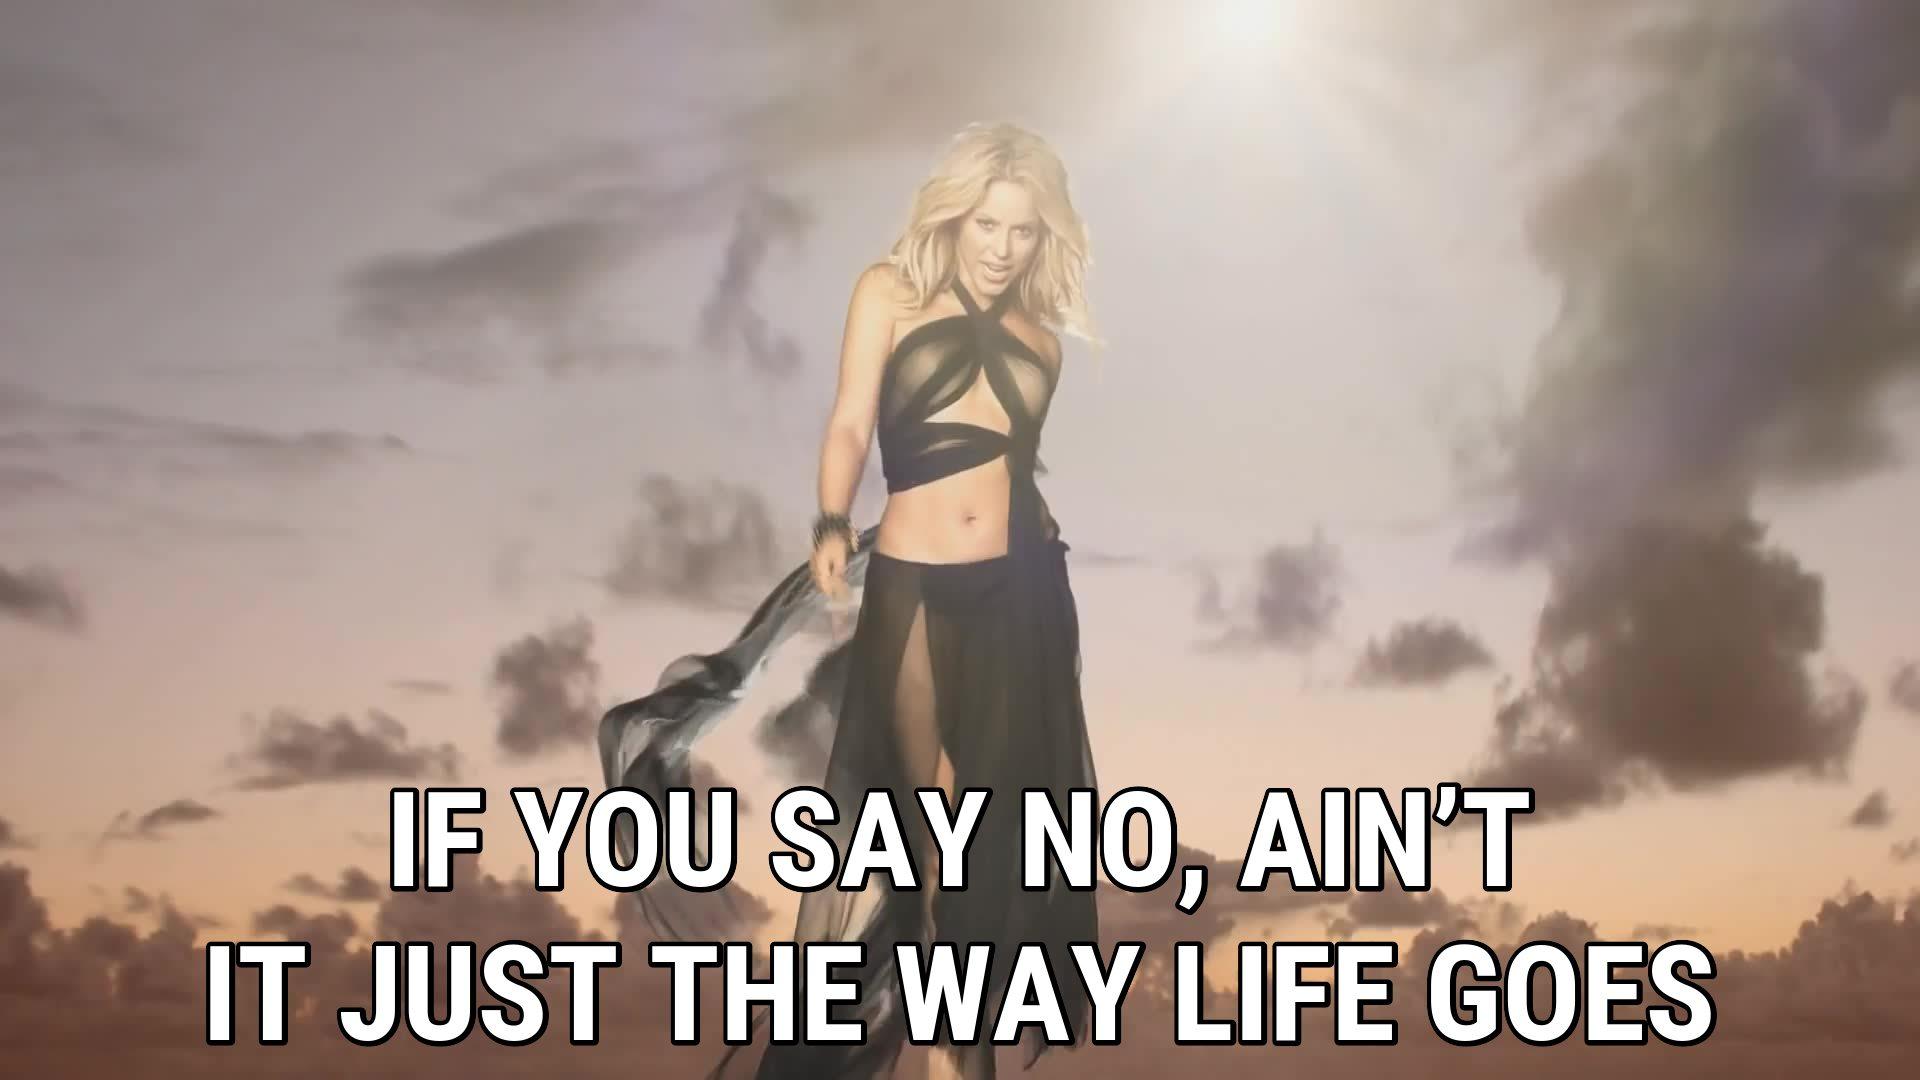 Gypsy lyrics Shakira song in images 1920x1080